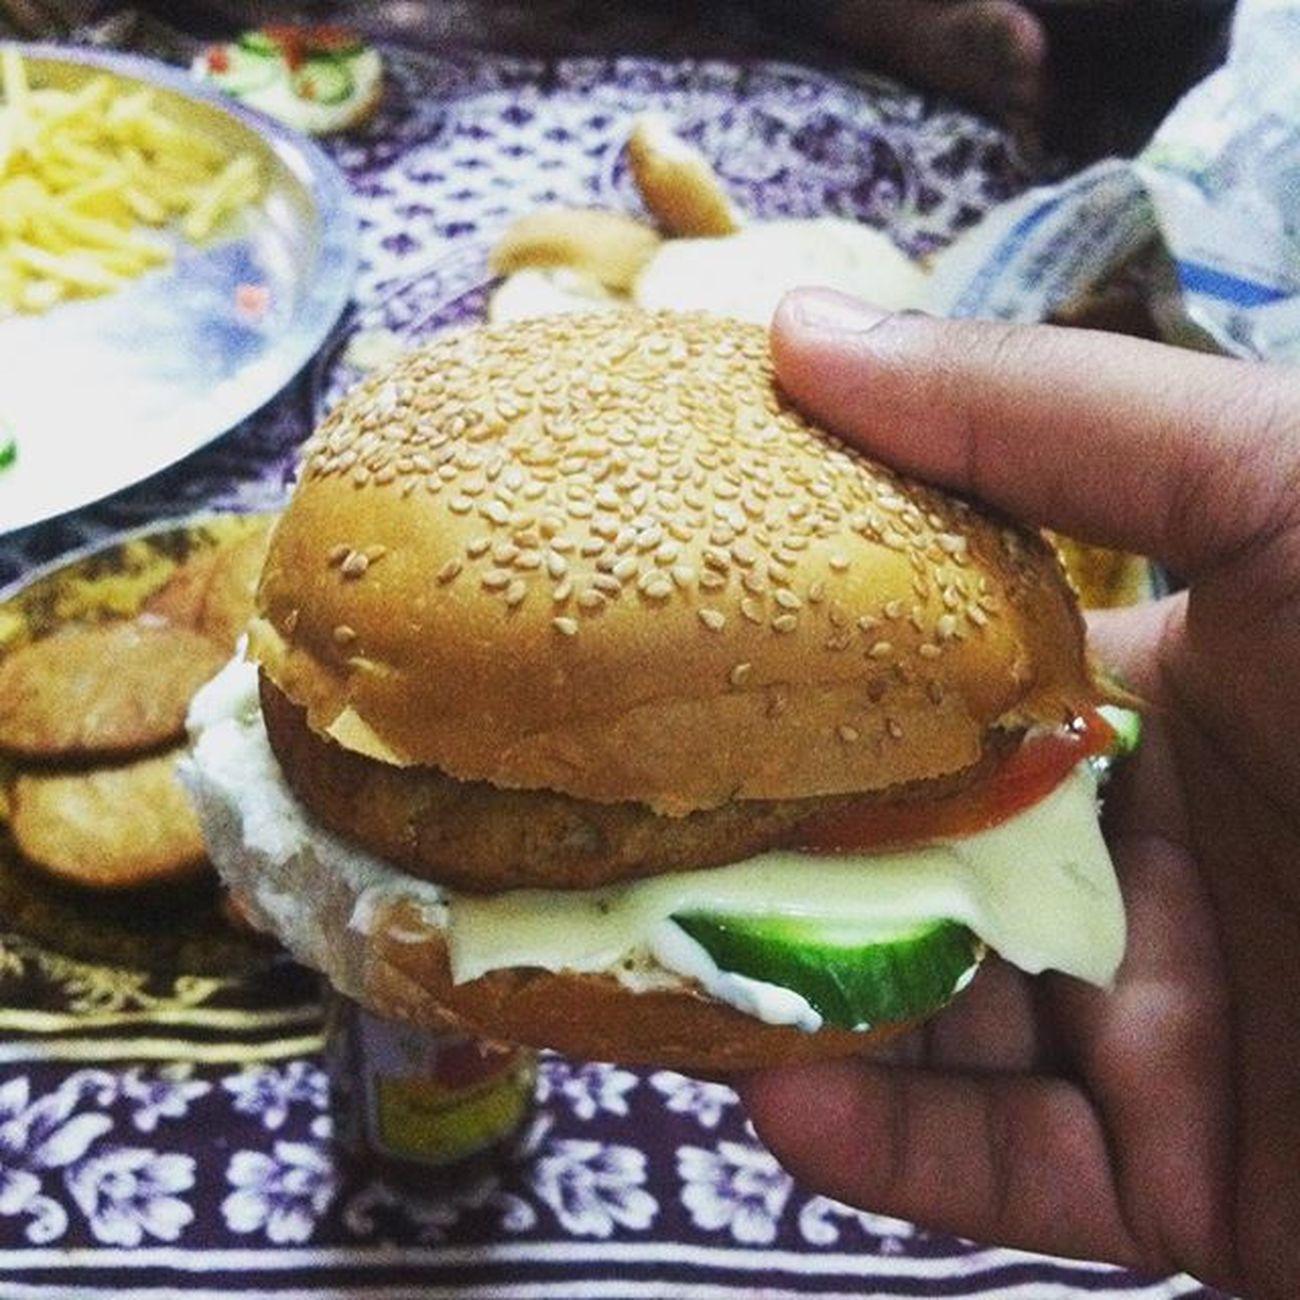 Homecooking Dinnertime Cookingfun Cookingfever Chickenburger Weekends Fridays Dubaiweekends Uaelife Instadaily Instalife Instamood Instadinner VSCO Vscocam Vscodinner